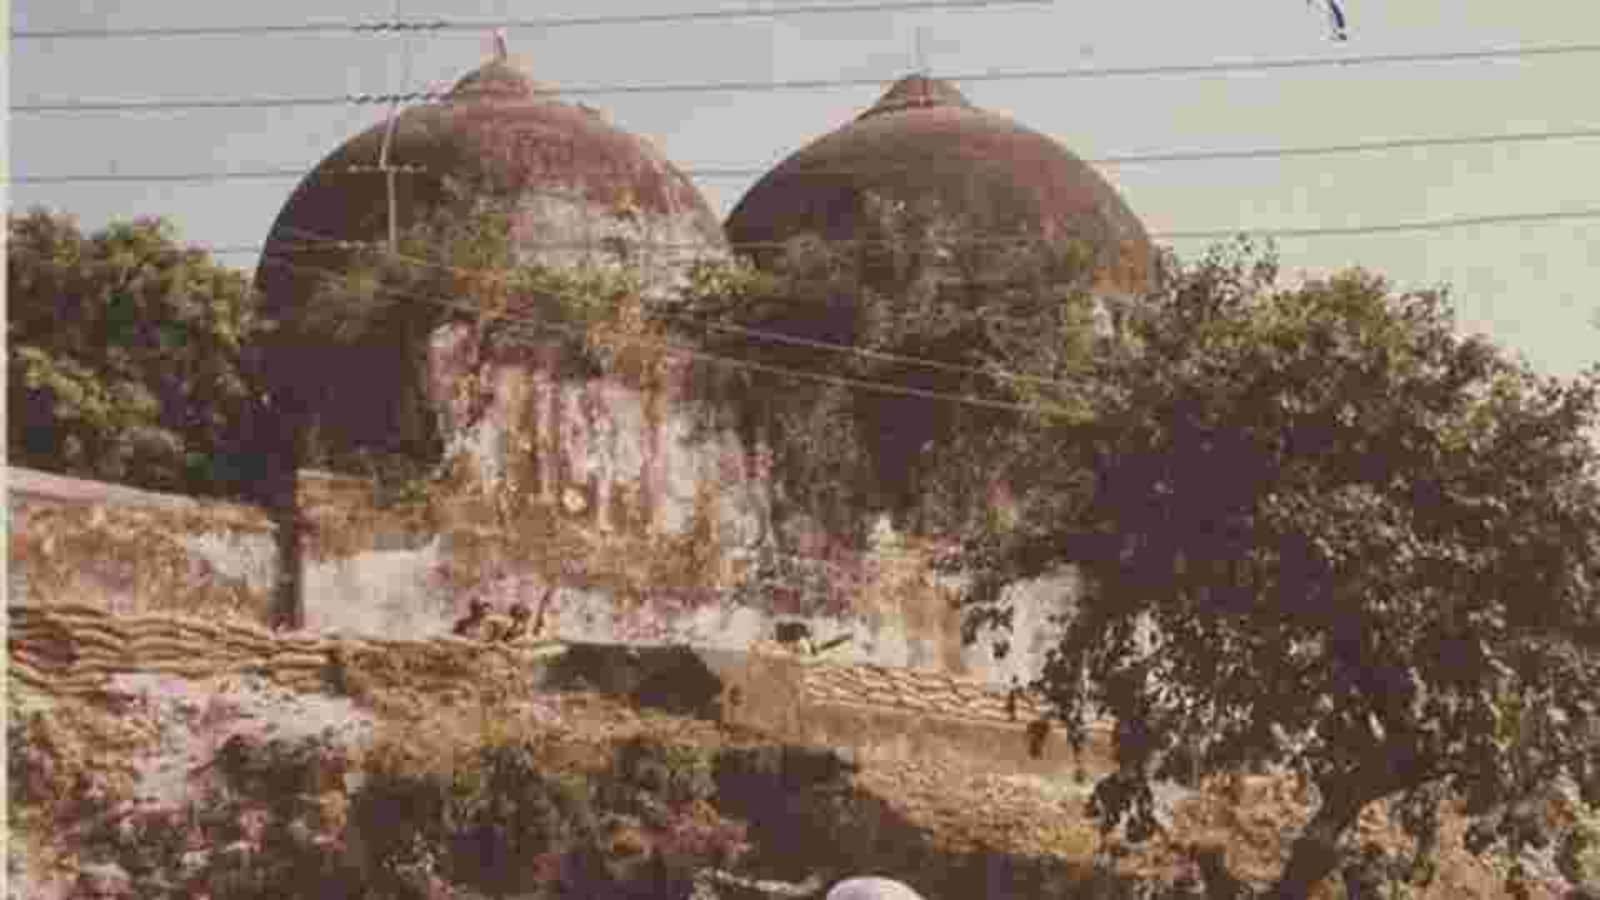 demolition of the babri masjid